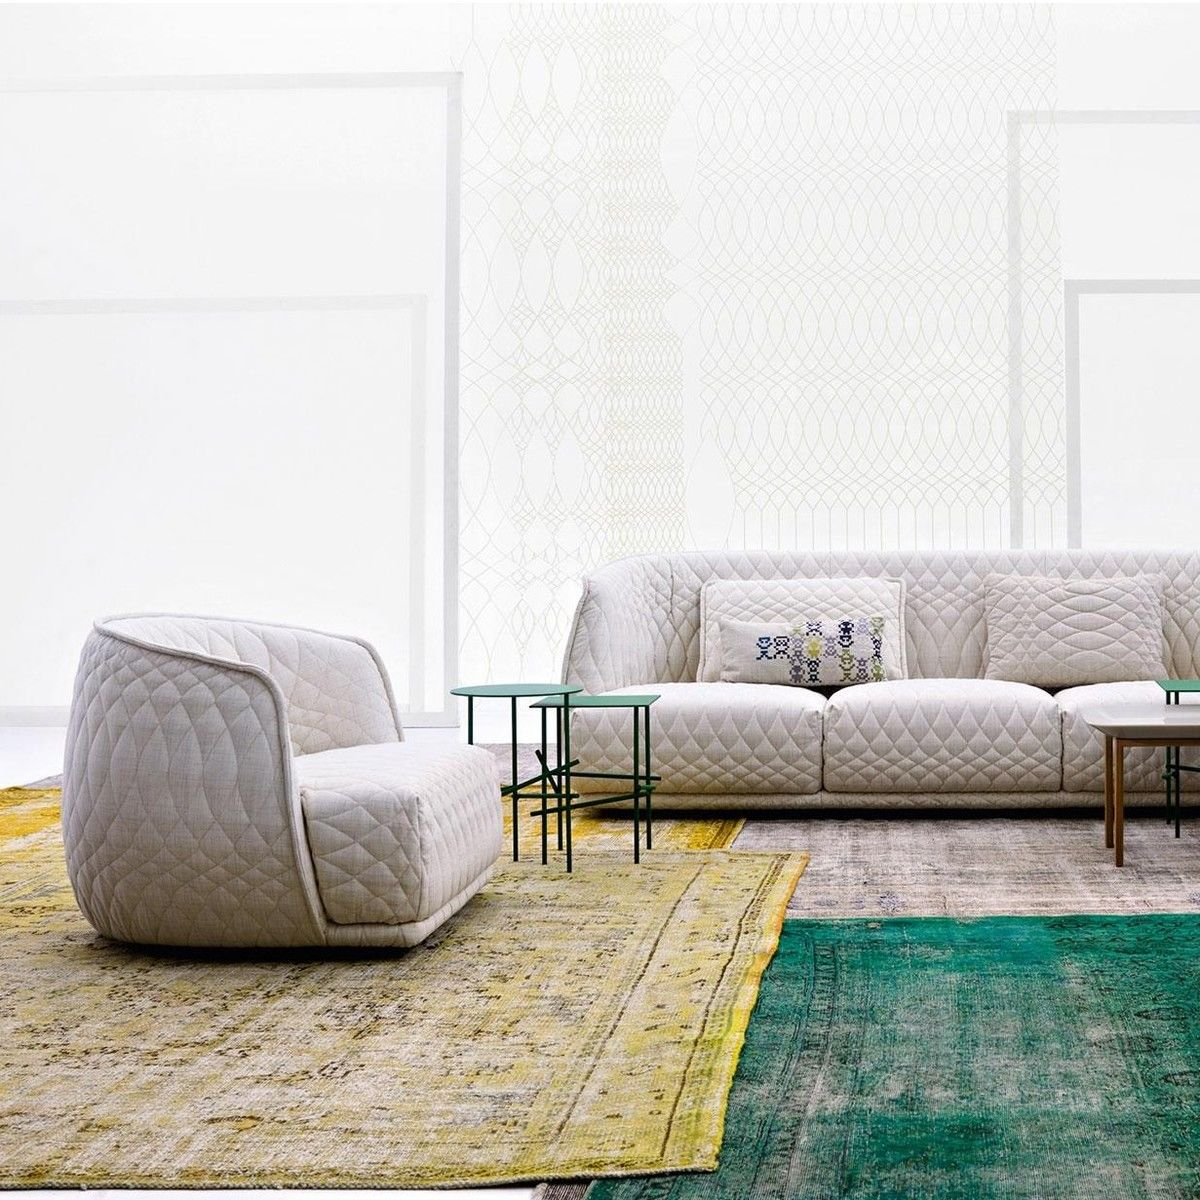 redondo armchair moroso. Black Bedroom Furniture Sets. Home Design Ideas